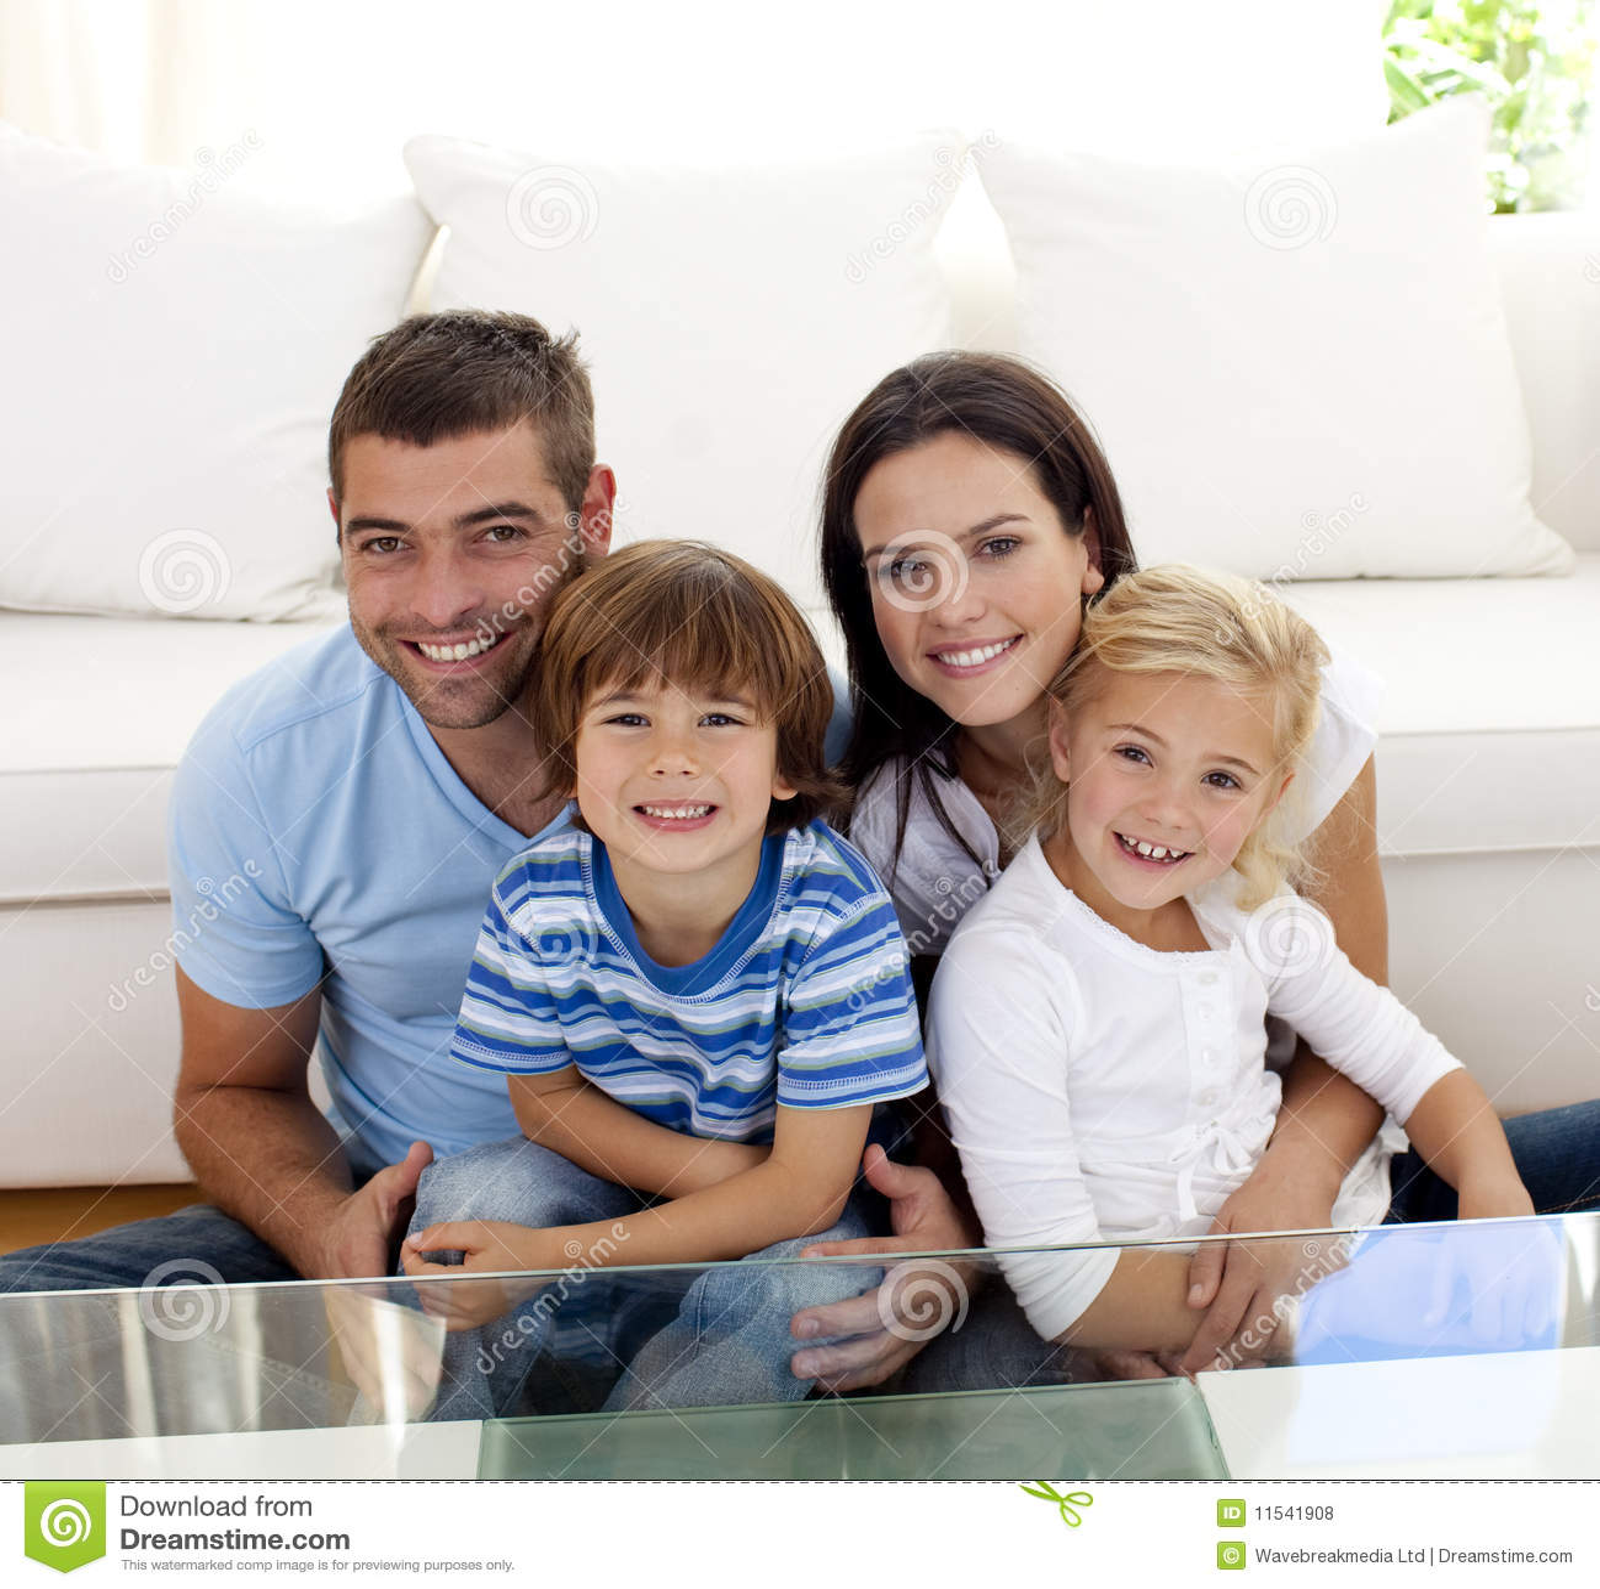 portrait happy family smiling living room 11541908